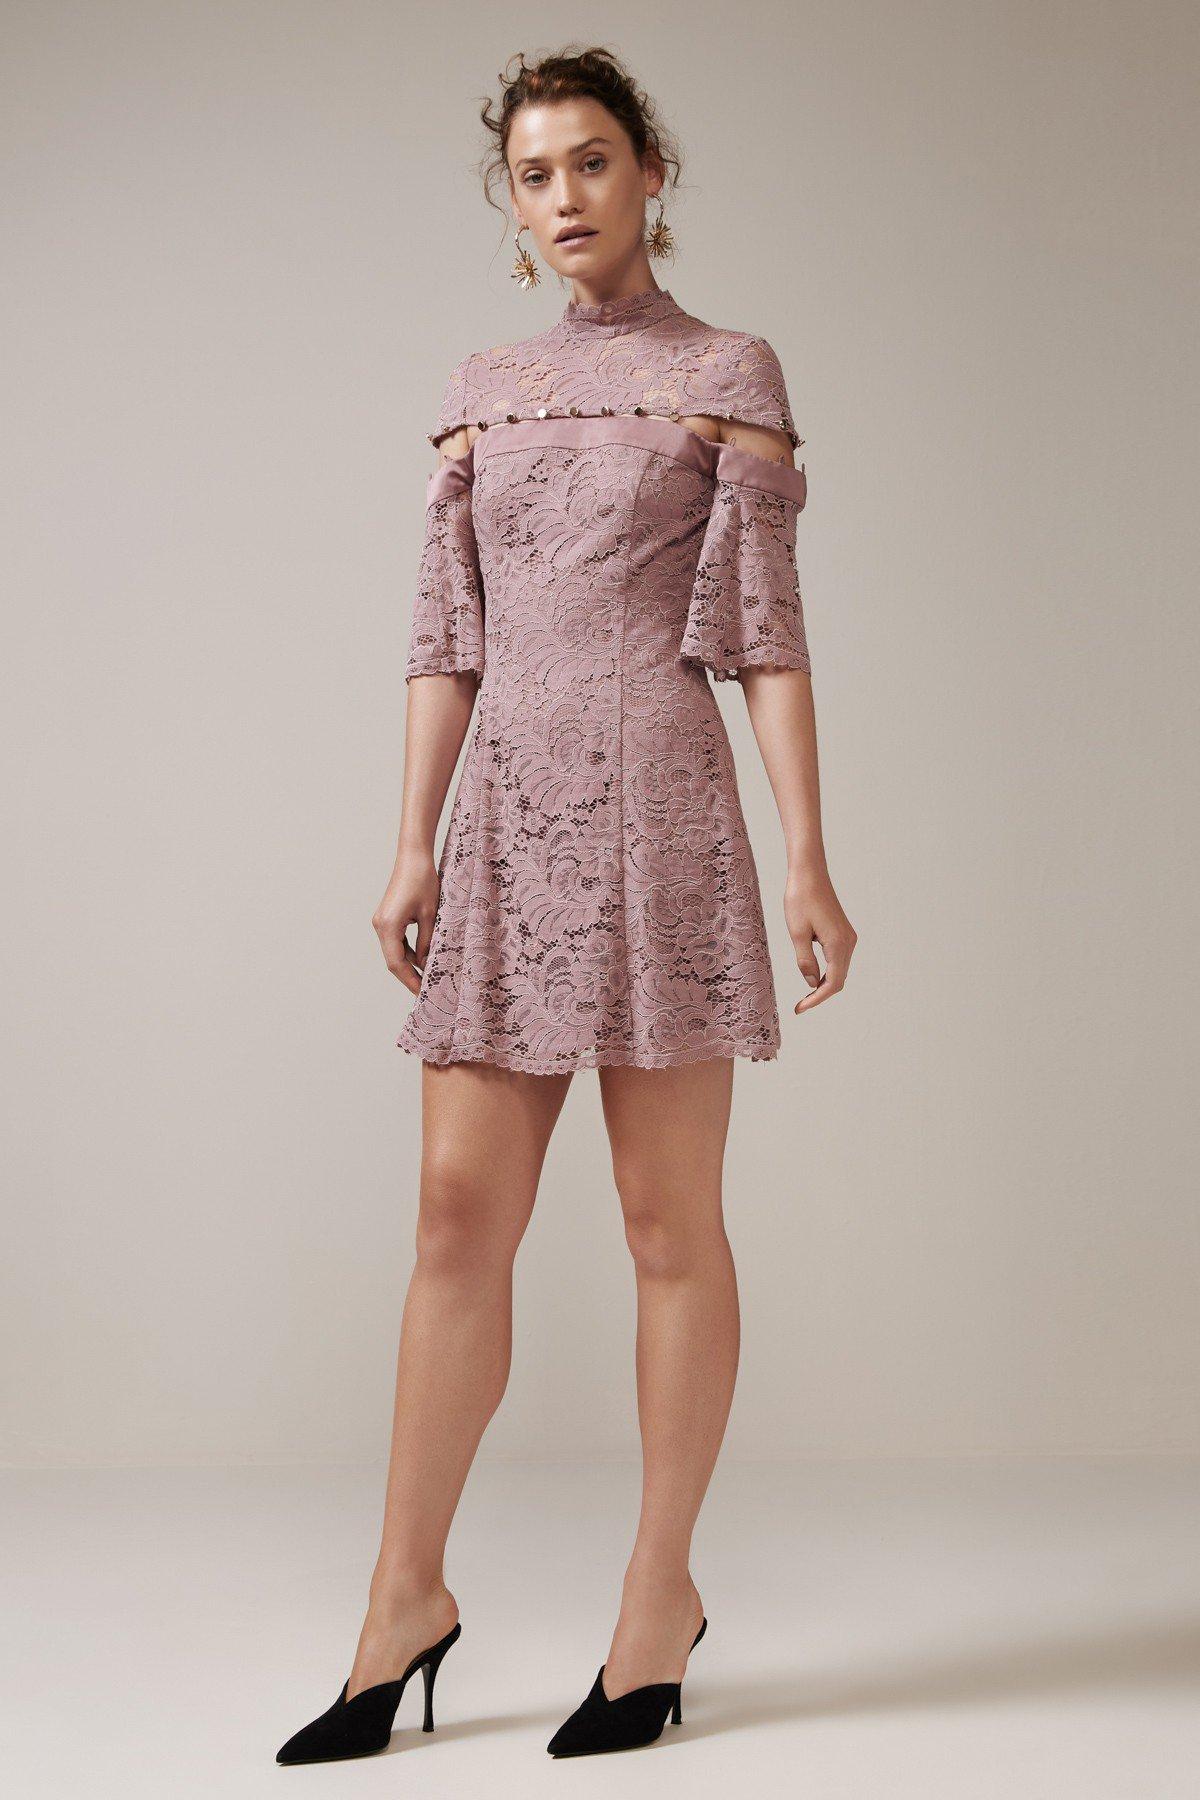 Shop Keepsake Star Crossed Lace Mini Dress.